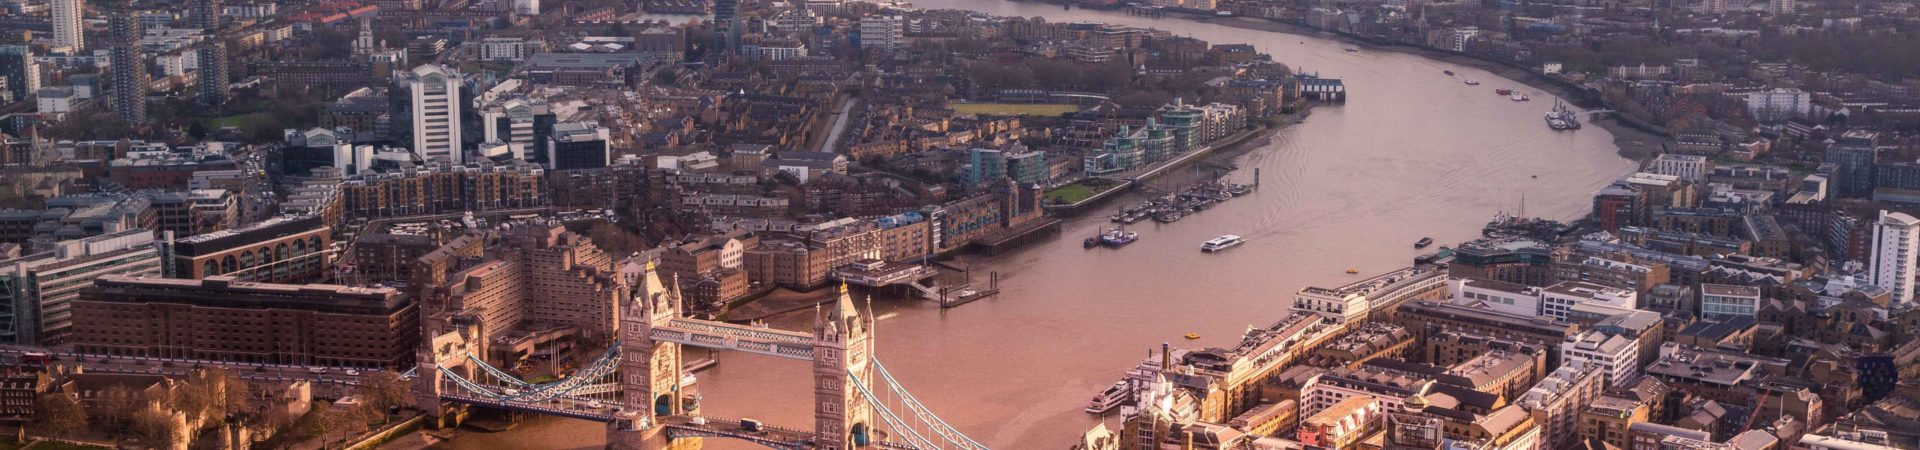 områder i london